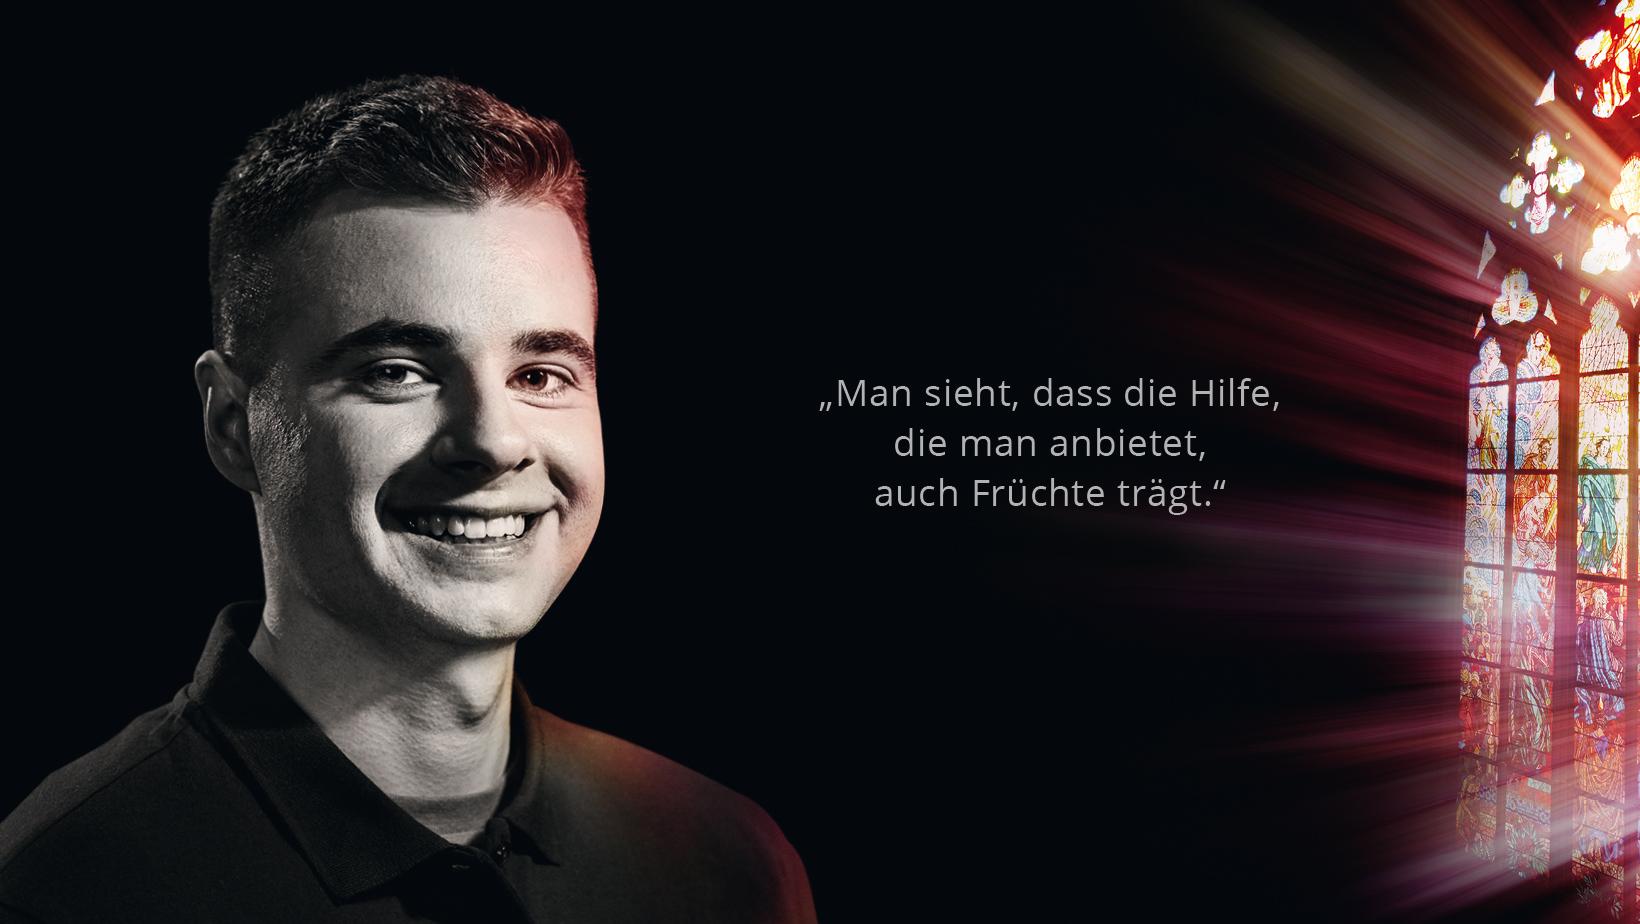 Krankenpfleger Marco Kulwicki